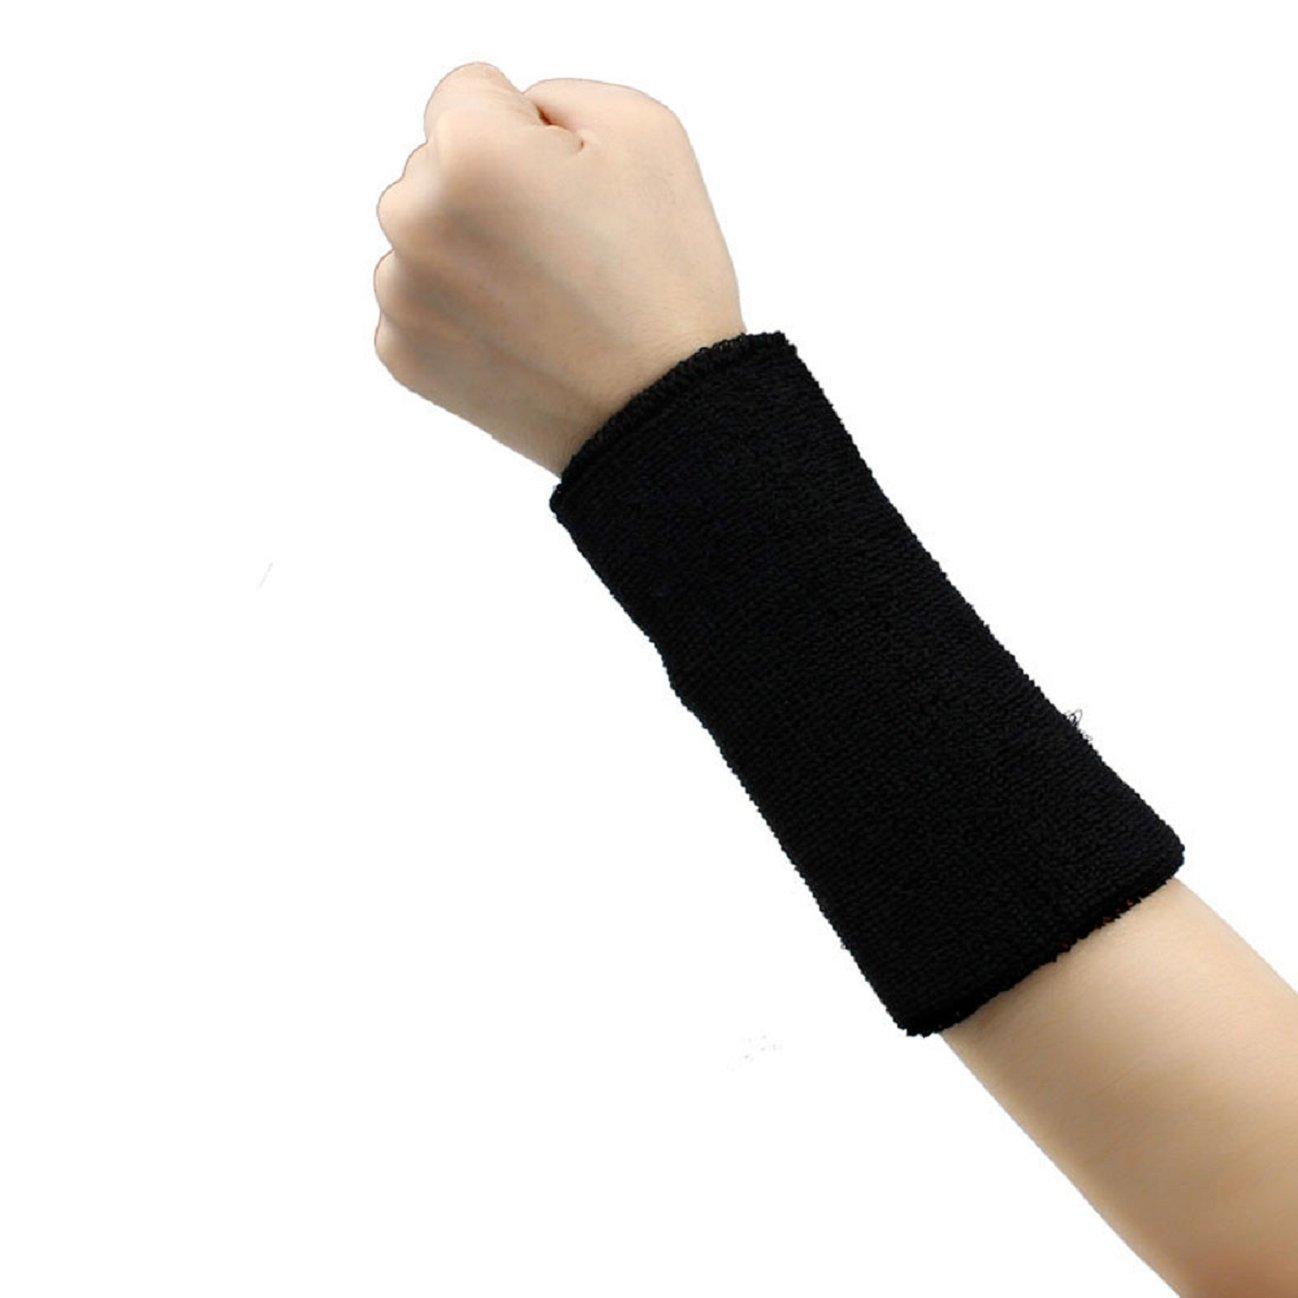 Tonsee 1 PCS Unisex Cotton Basketball Tennis Gym Yoga Sweatband Wristband (Black)